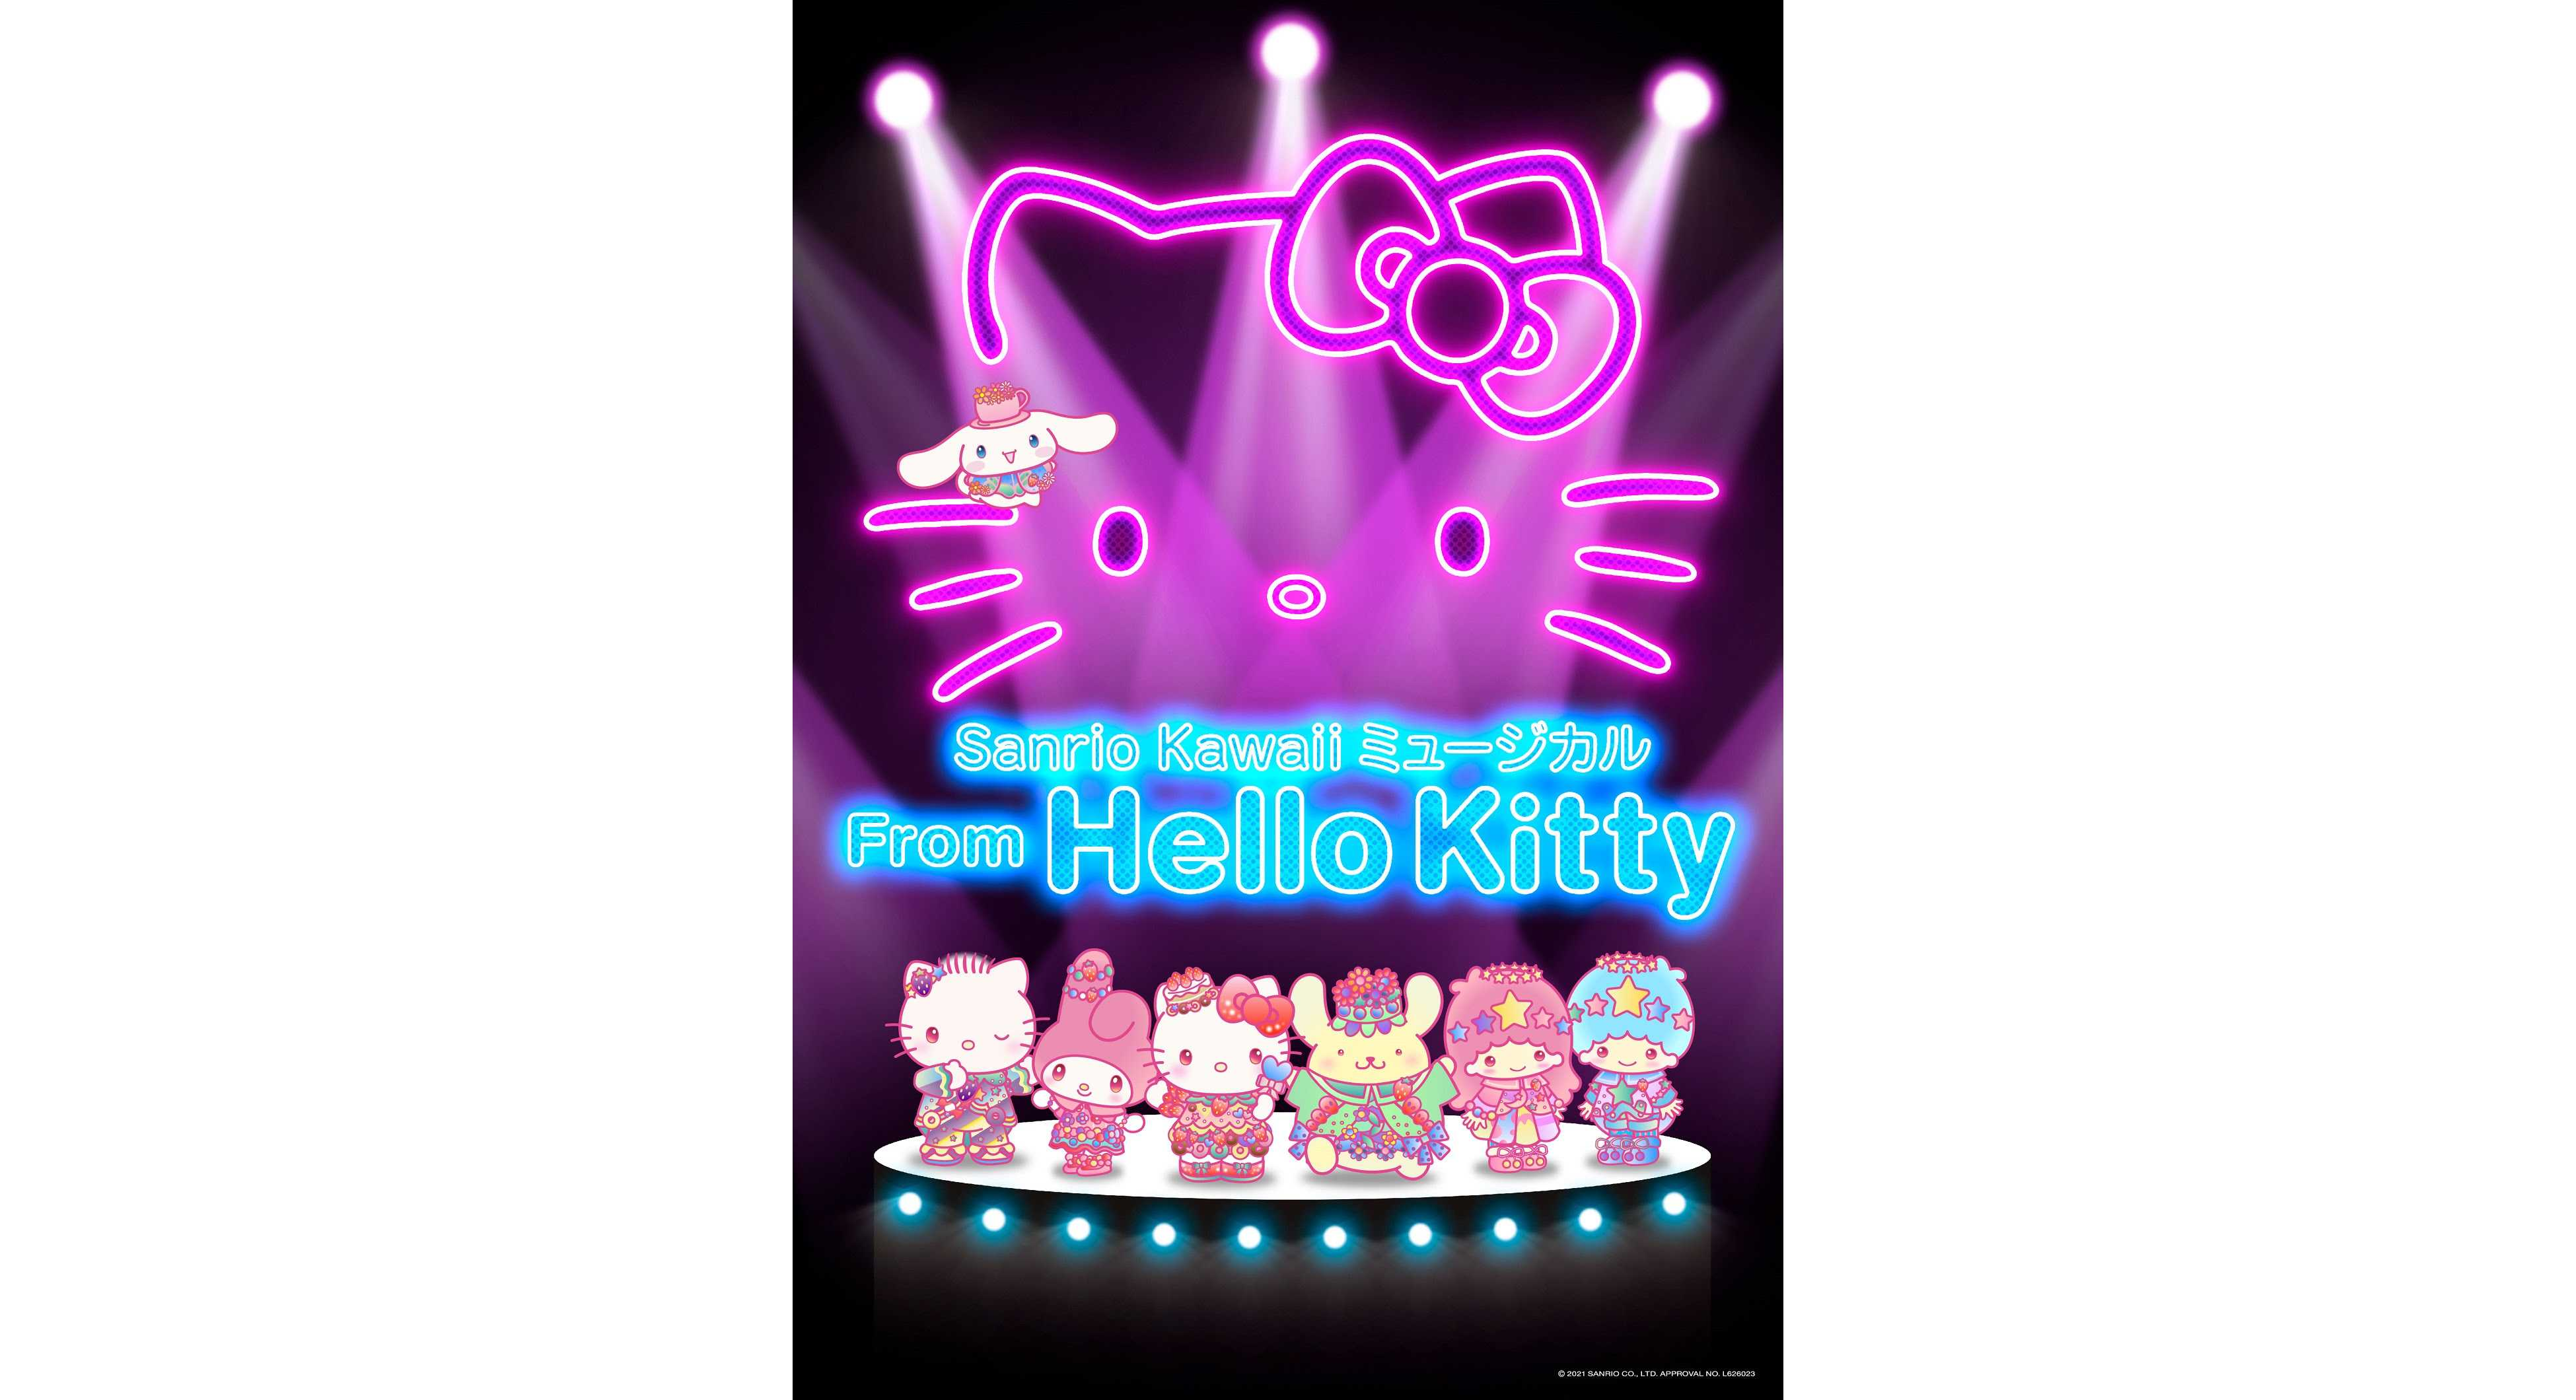 Sanrio Kawaii ミュージカル『From Hello Kitty』 5